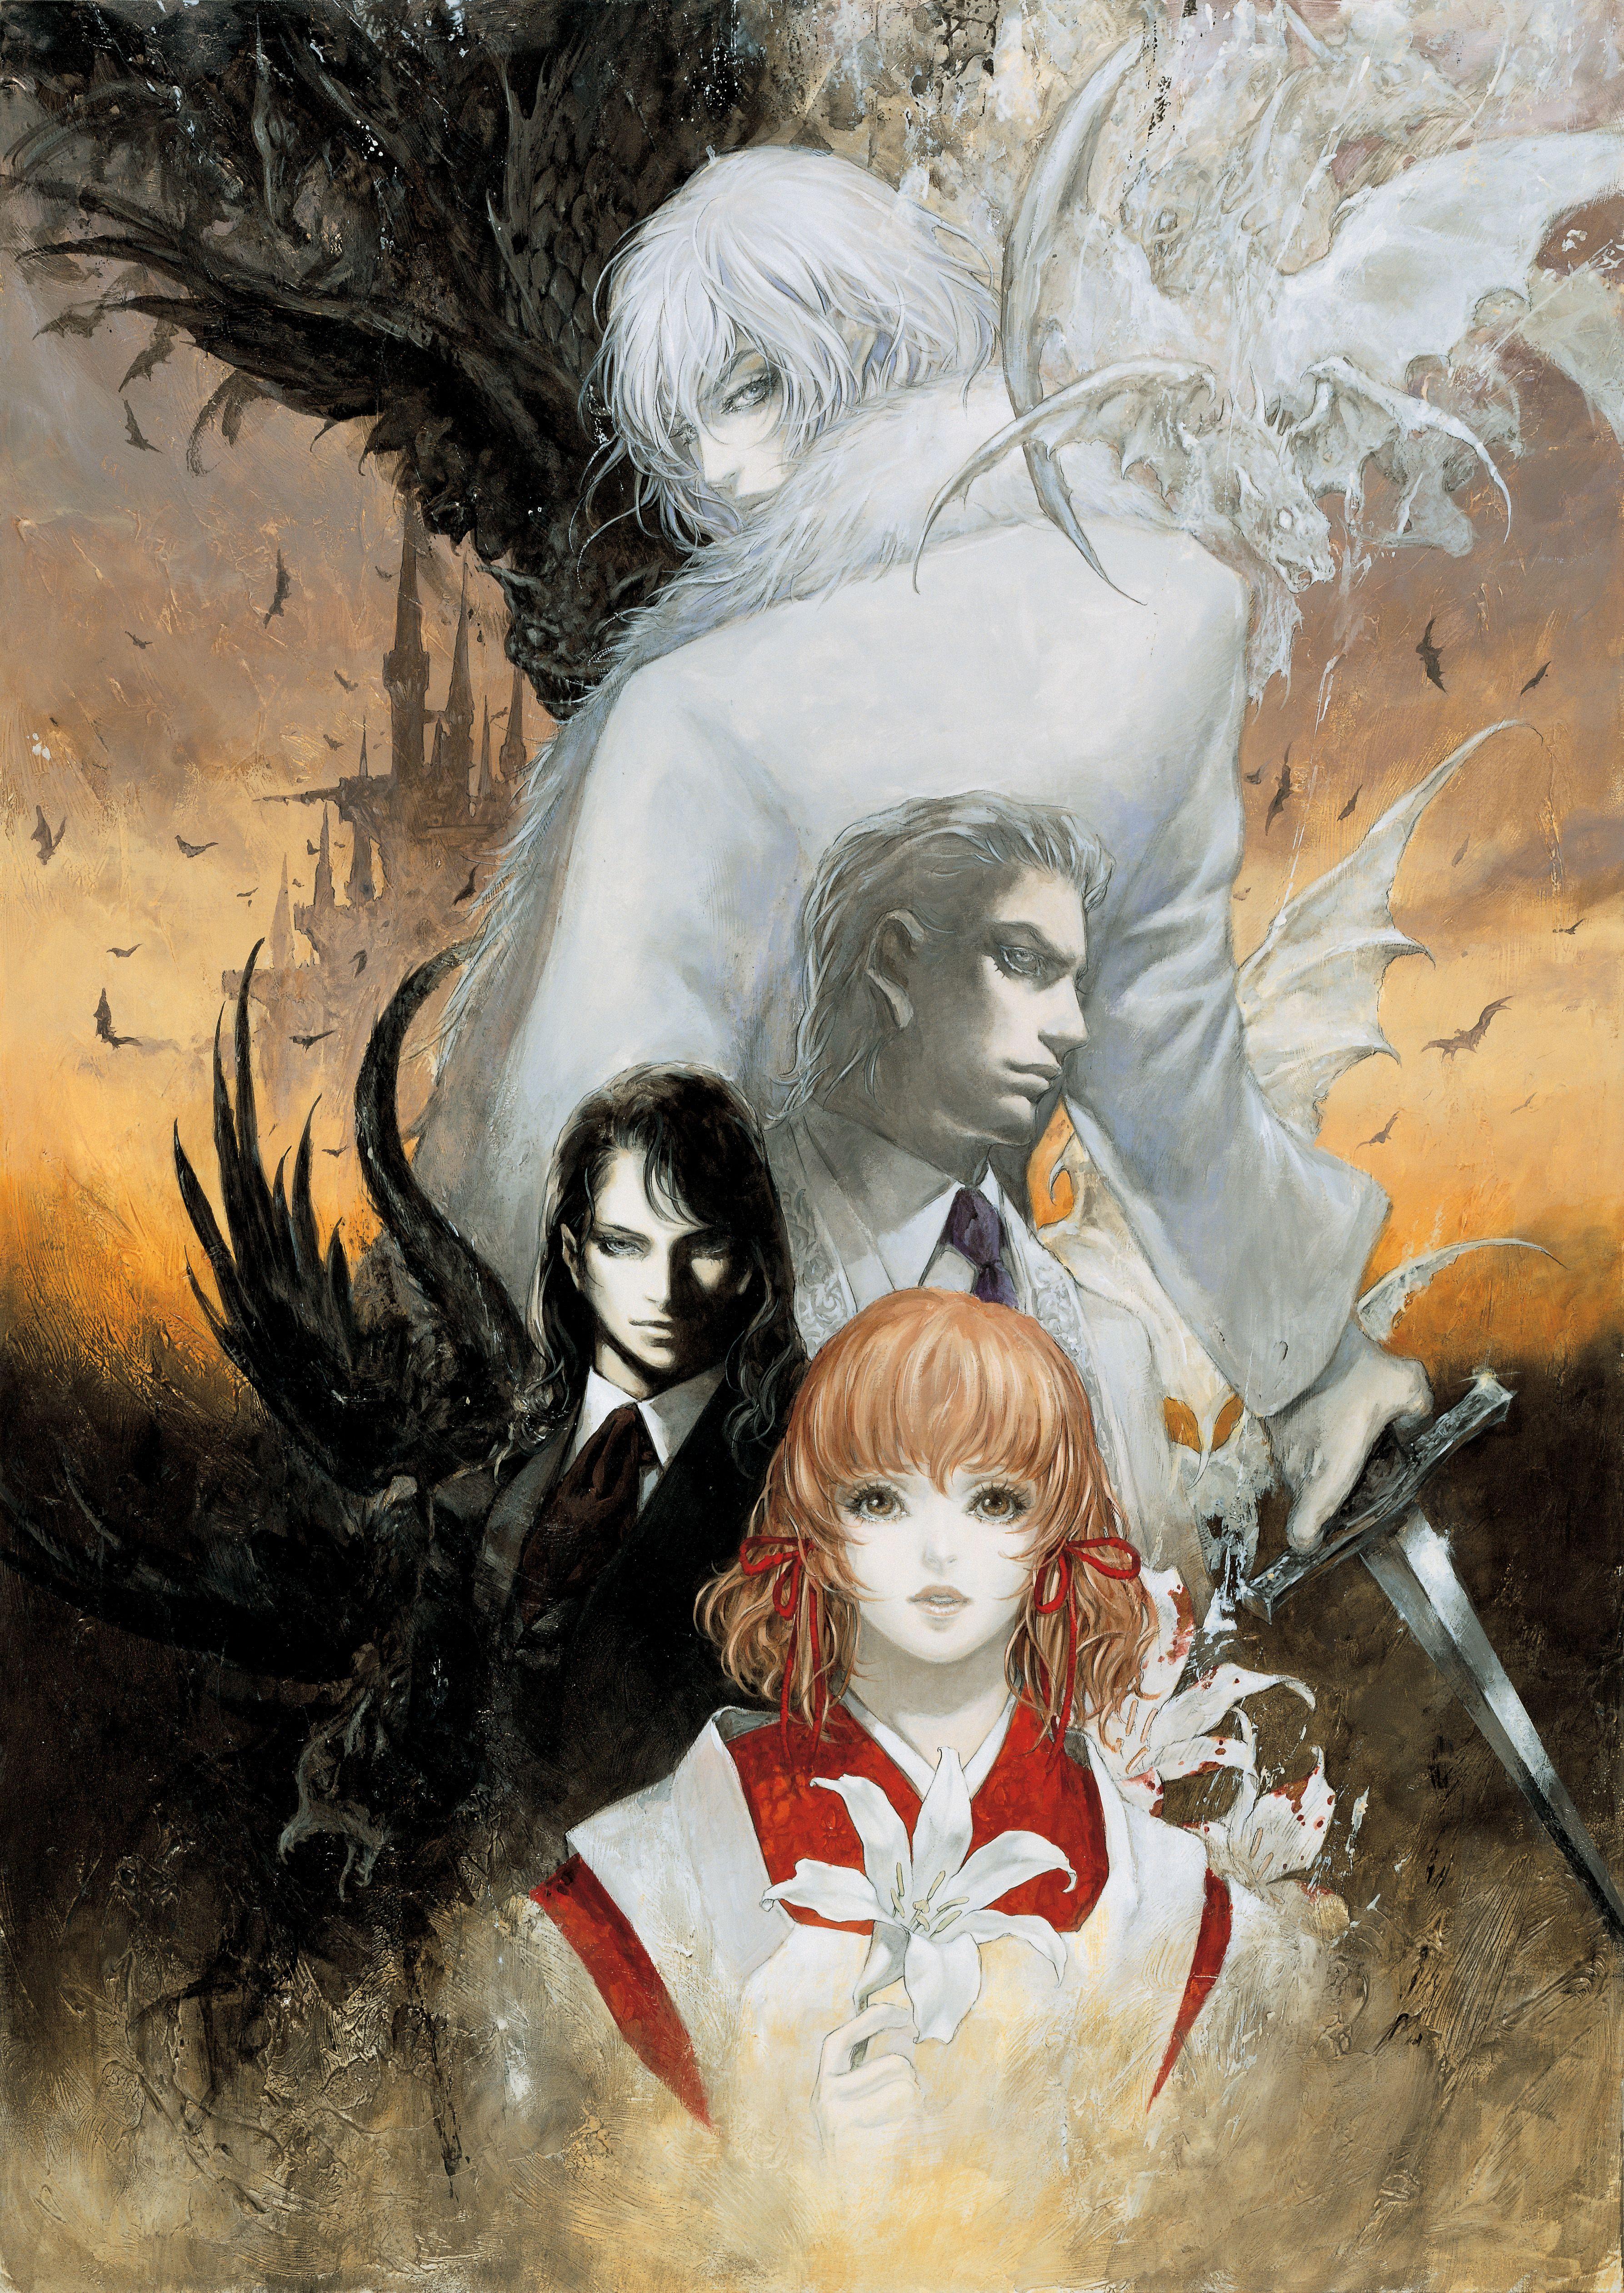 Castlevania Aria Of Sorrow Art Character Art